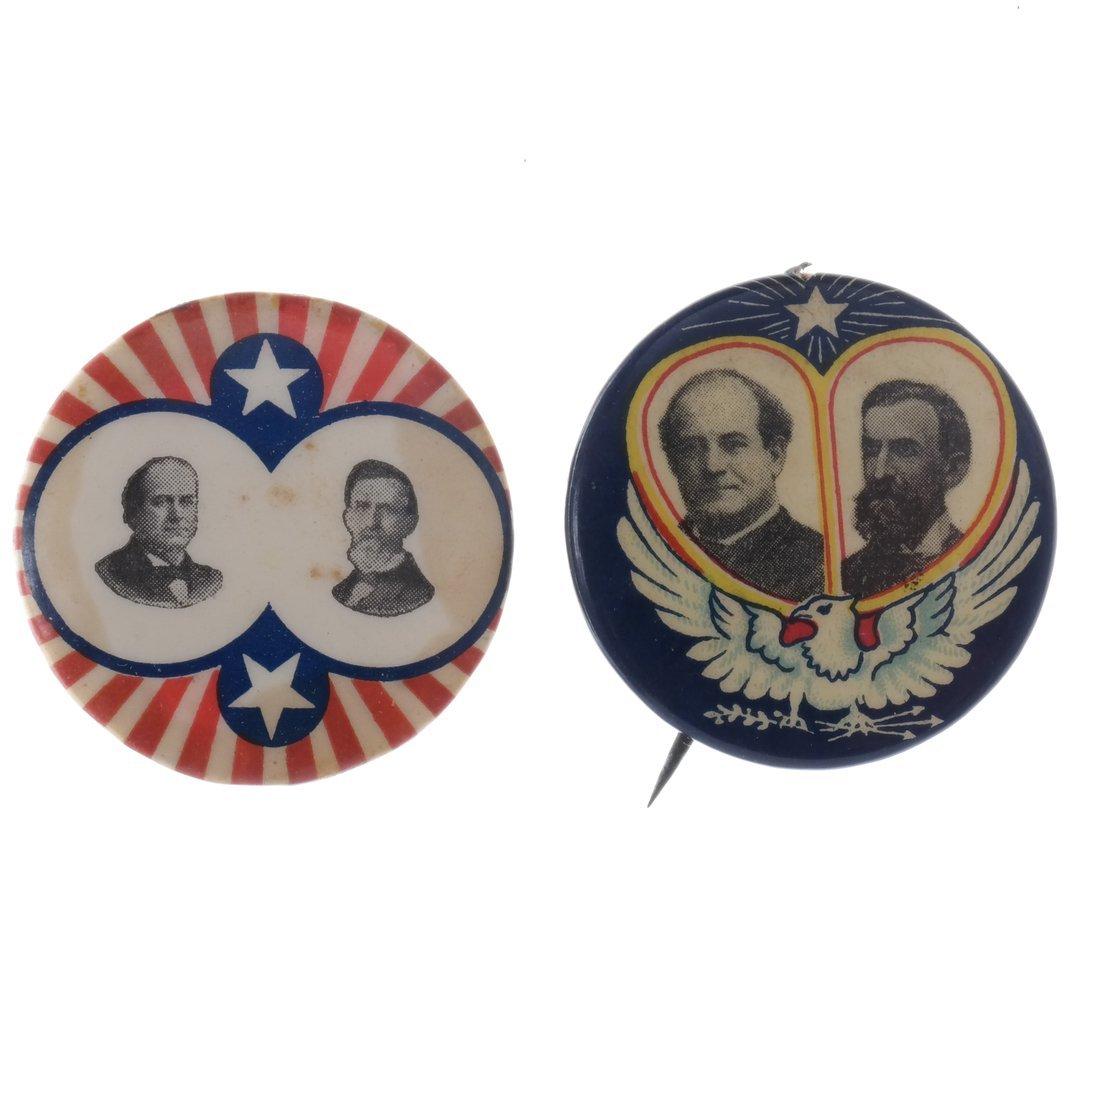 Wm. J. Bryan & J.W. Kern - Two 1908 Jugates Buttons